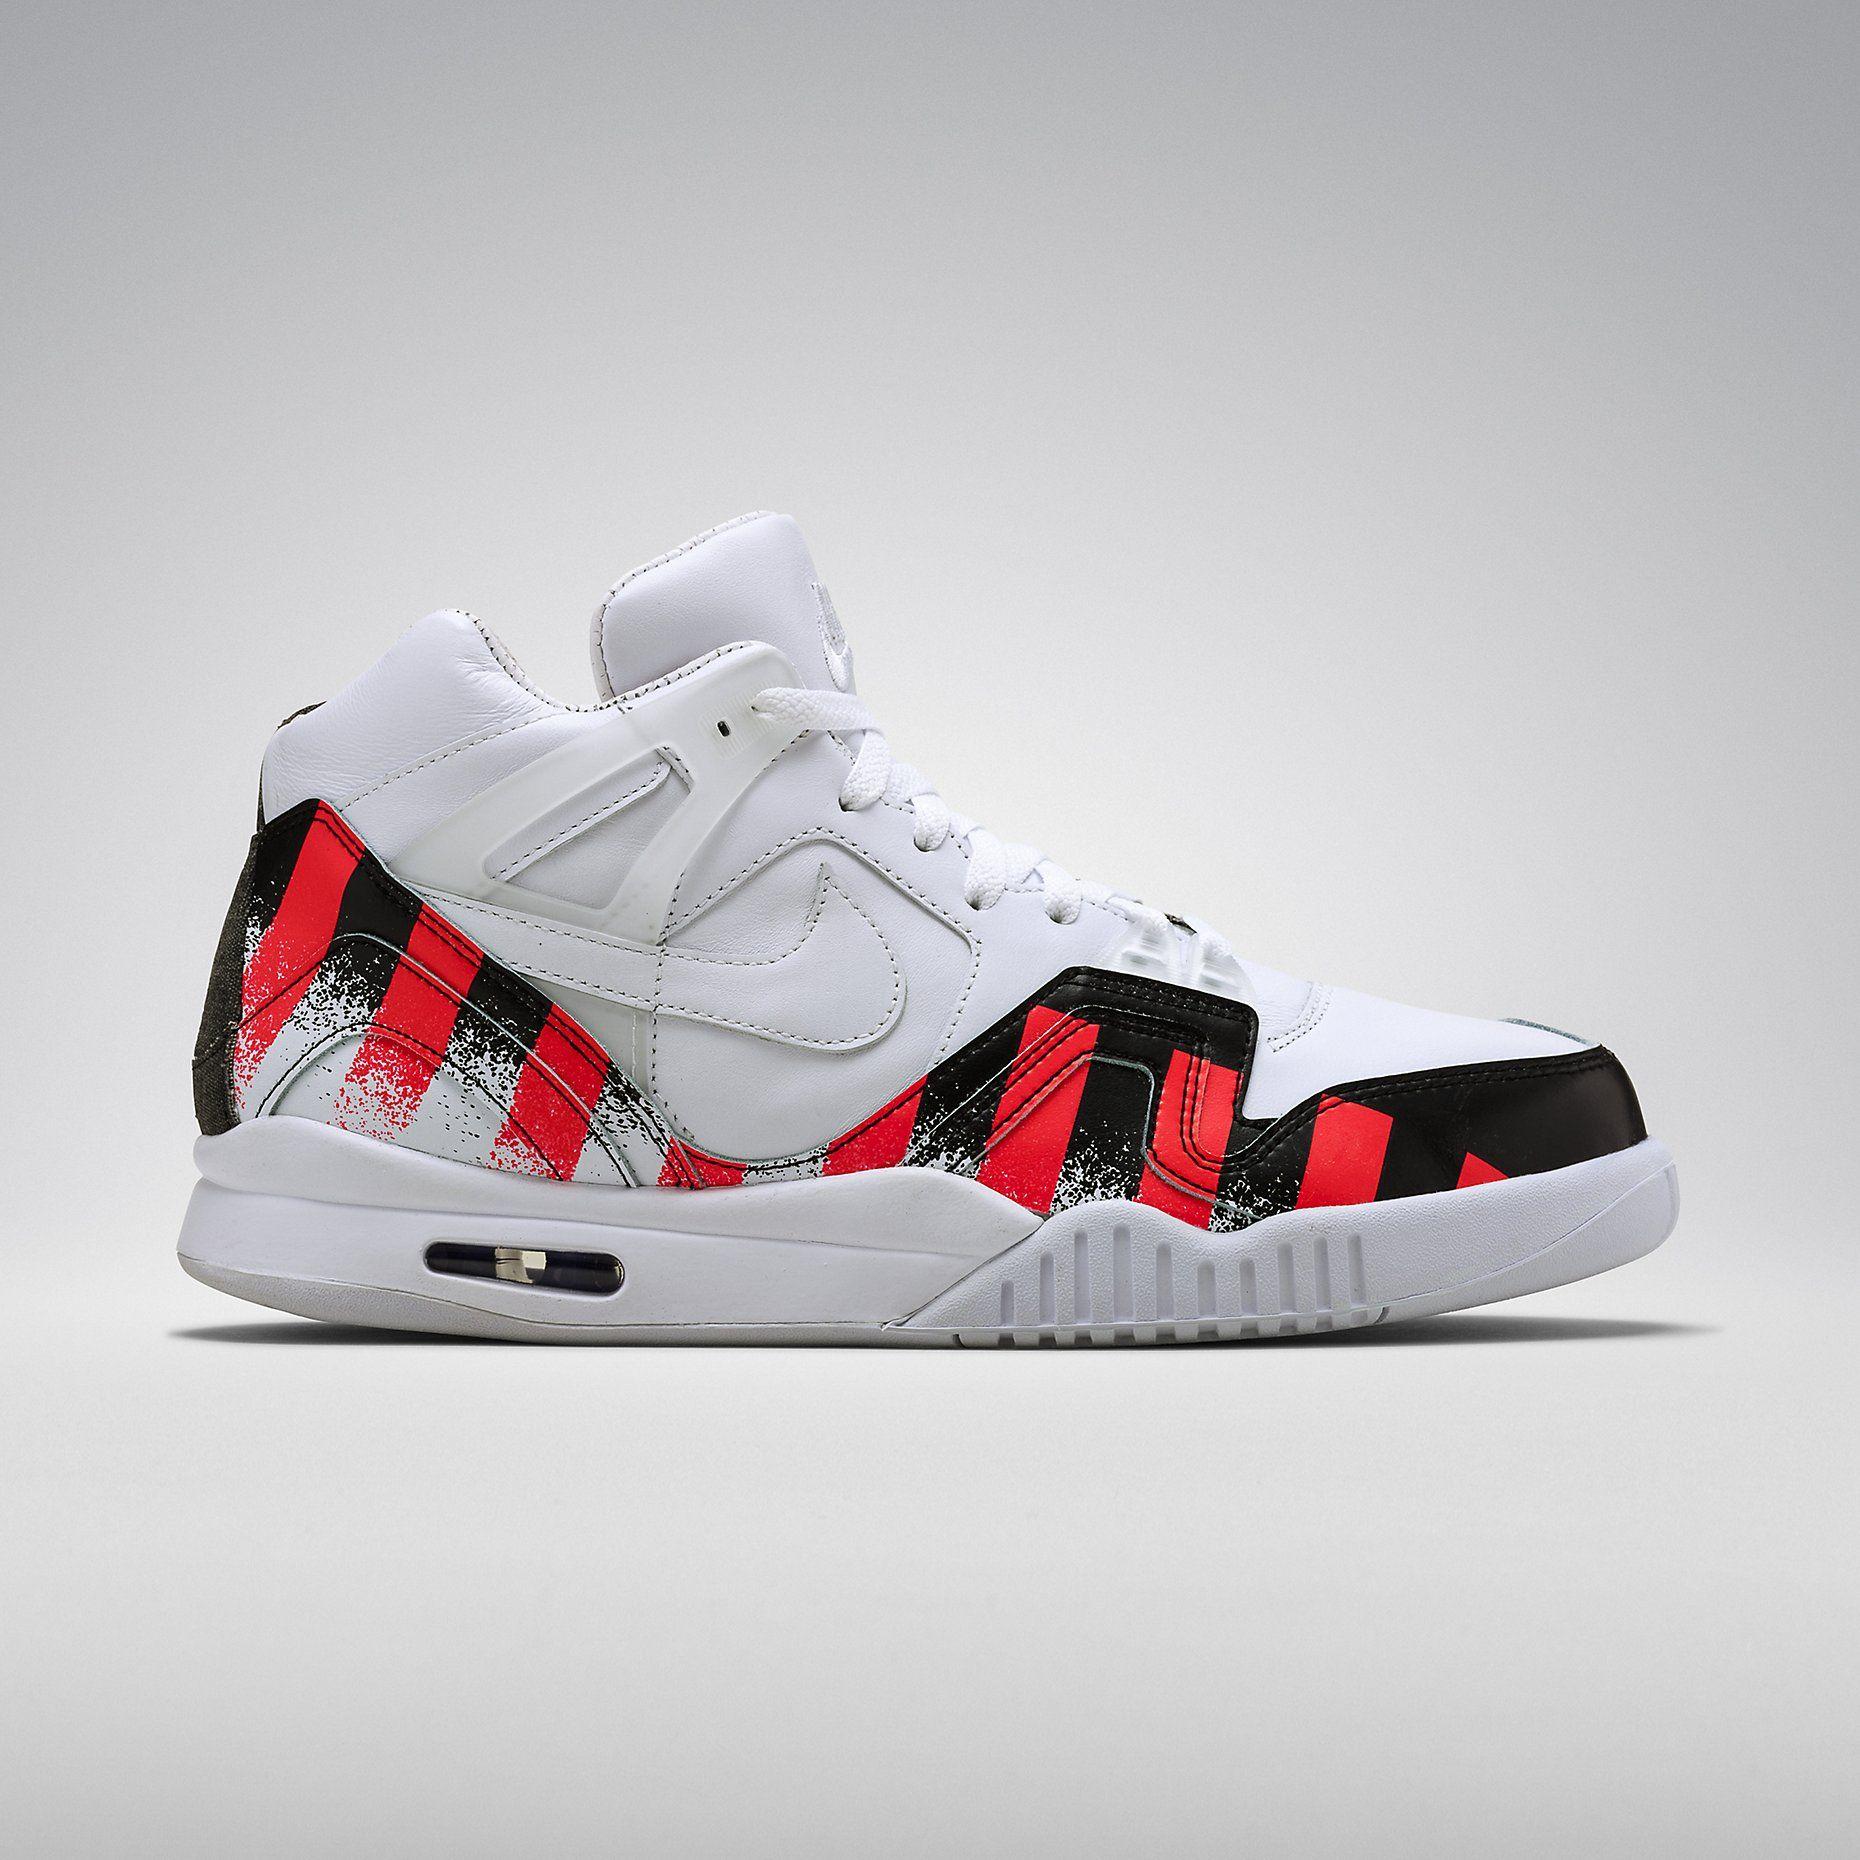 Nike Court Air Tech Challenge II Shoes mens, Shoes